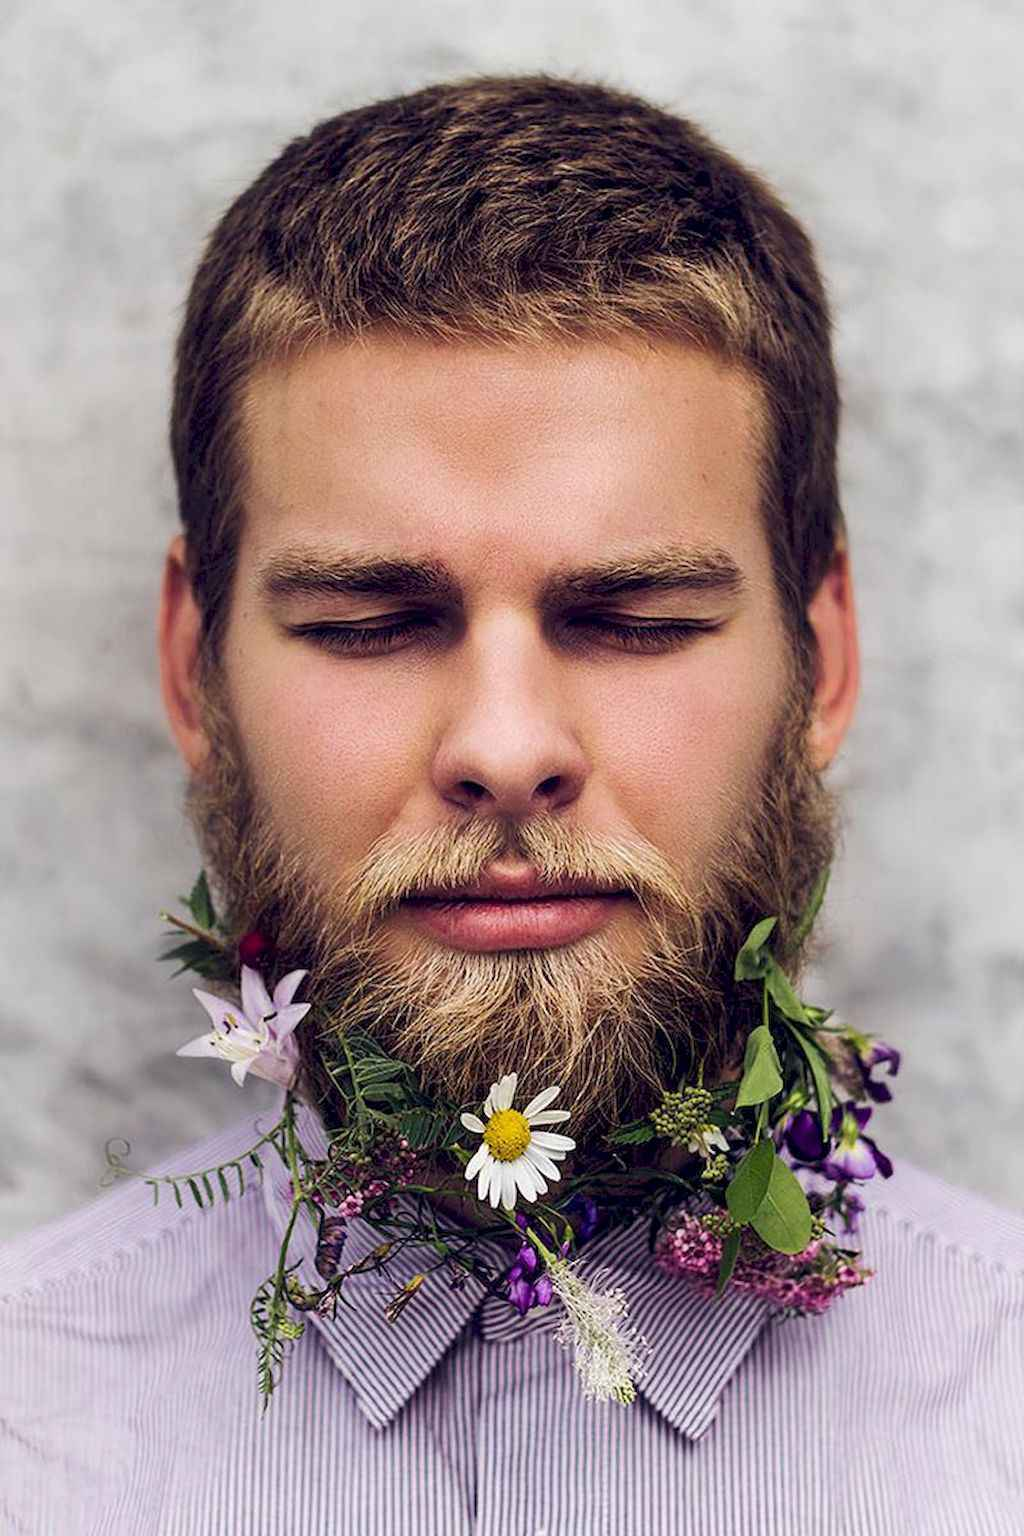 37 Most Elaborate Flower Beard Ideas